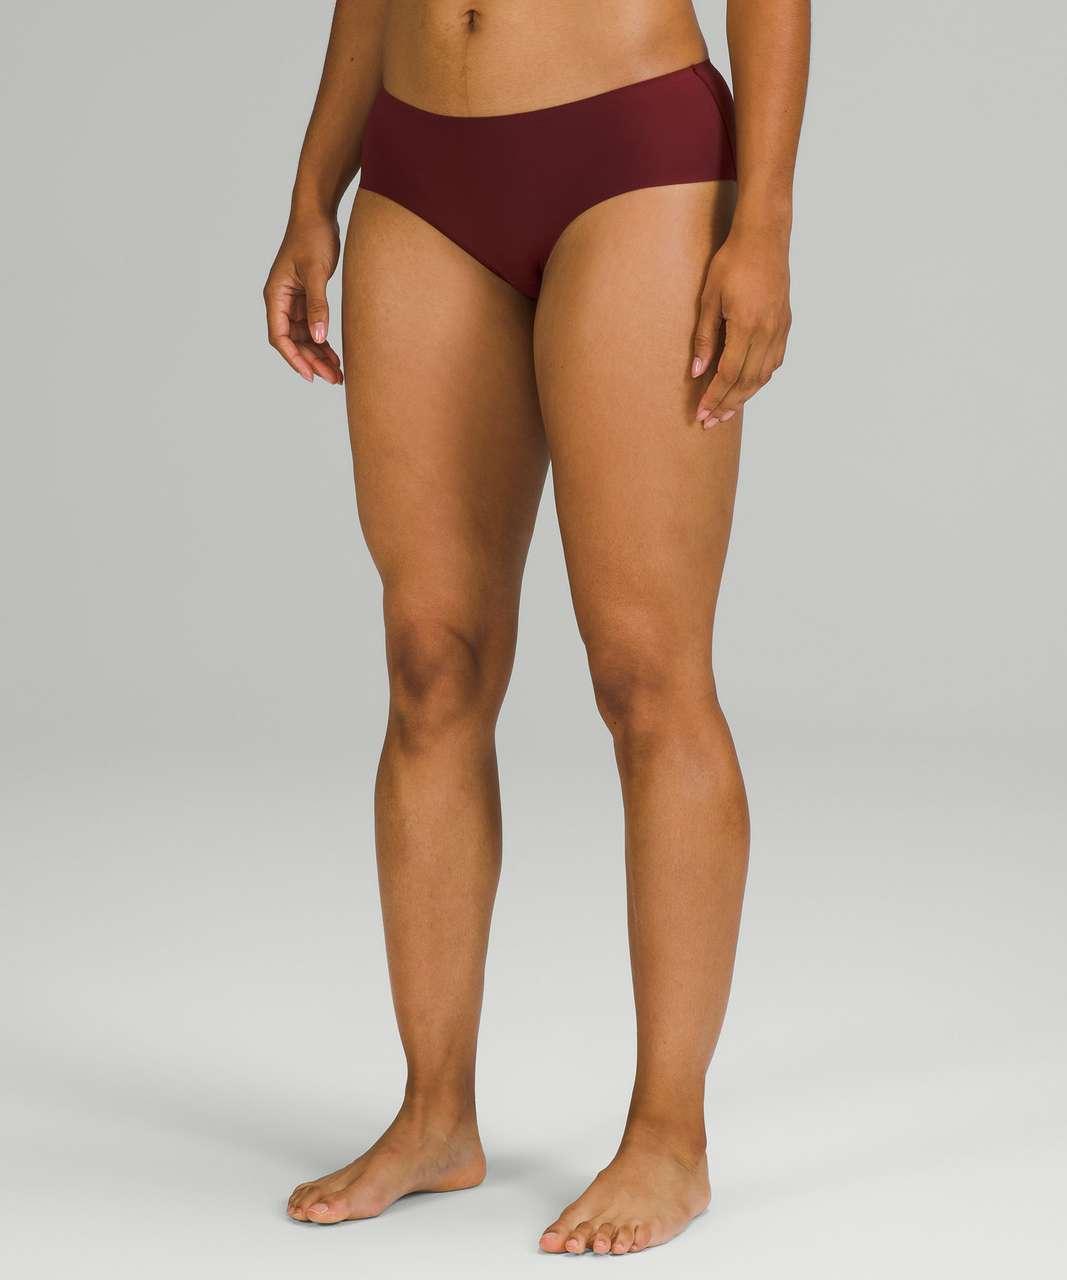 Lululemon InvisiWear Mid Rise Hipster Underwear - Red Merlot